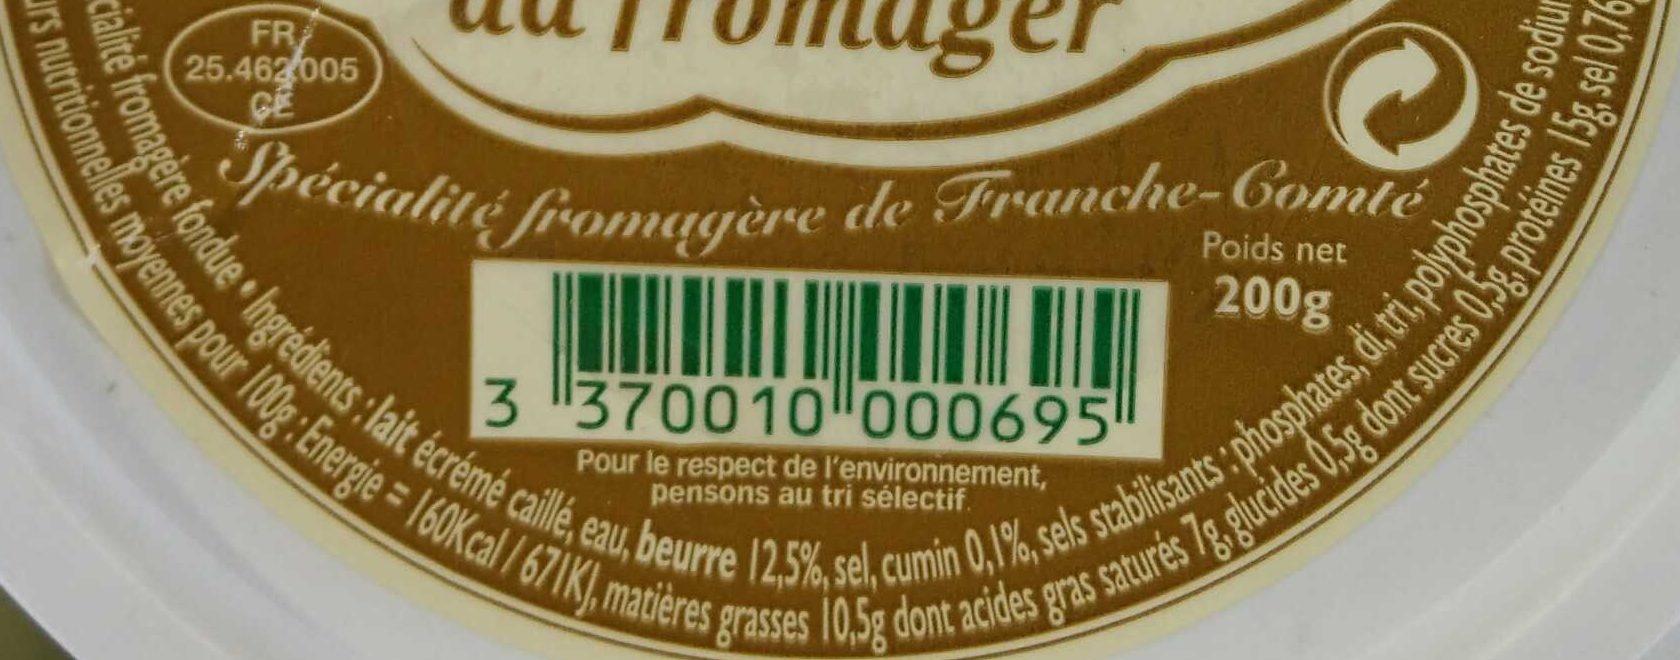 Cancoillotte du Fromager au Cumin 200g - Informations nutritionnelles - fr